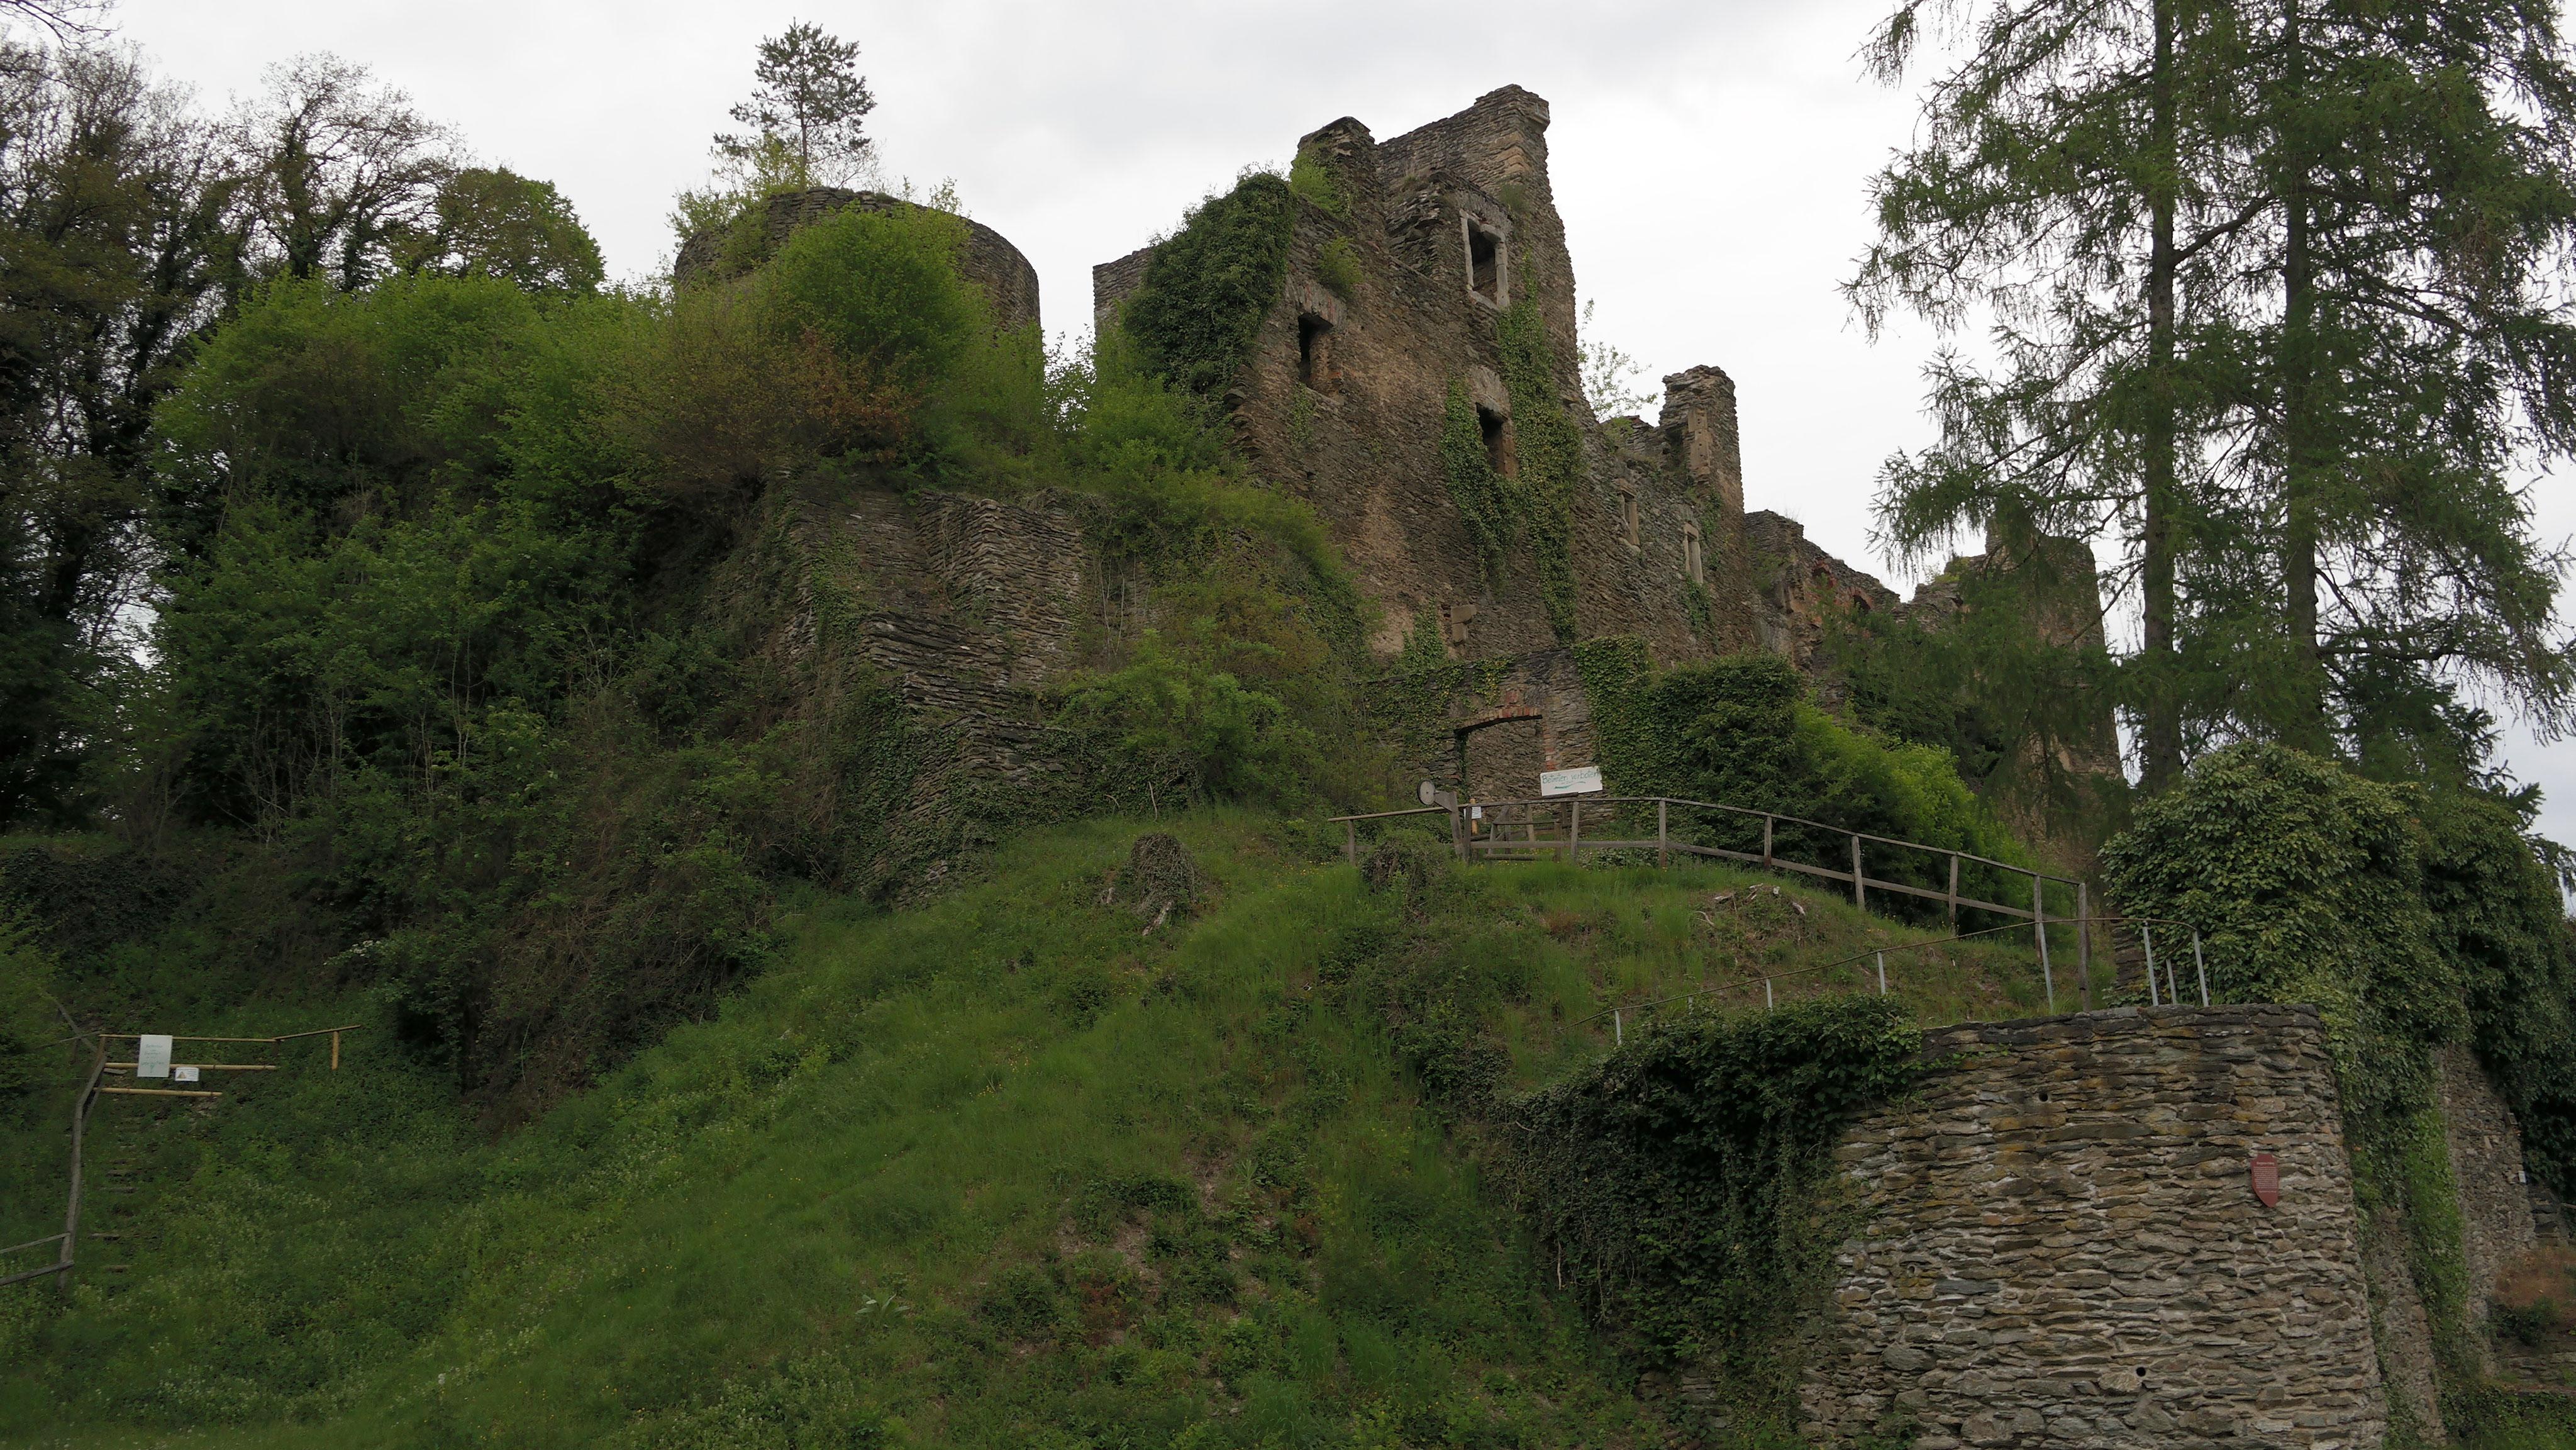 Burgruine - Dalberg (Landkreis Bad Kreuznach) - Burgen